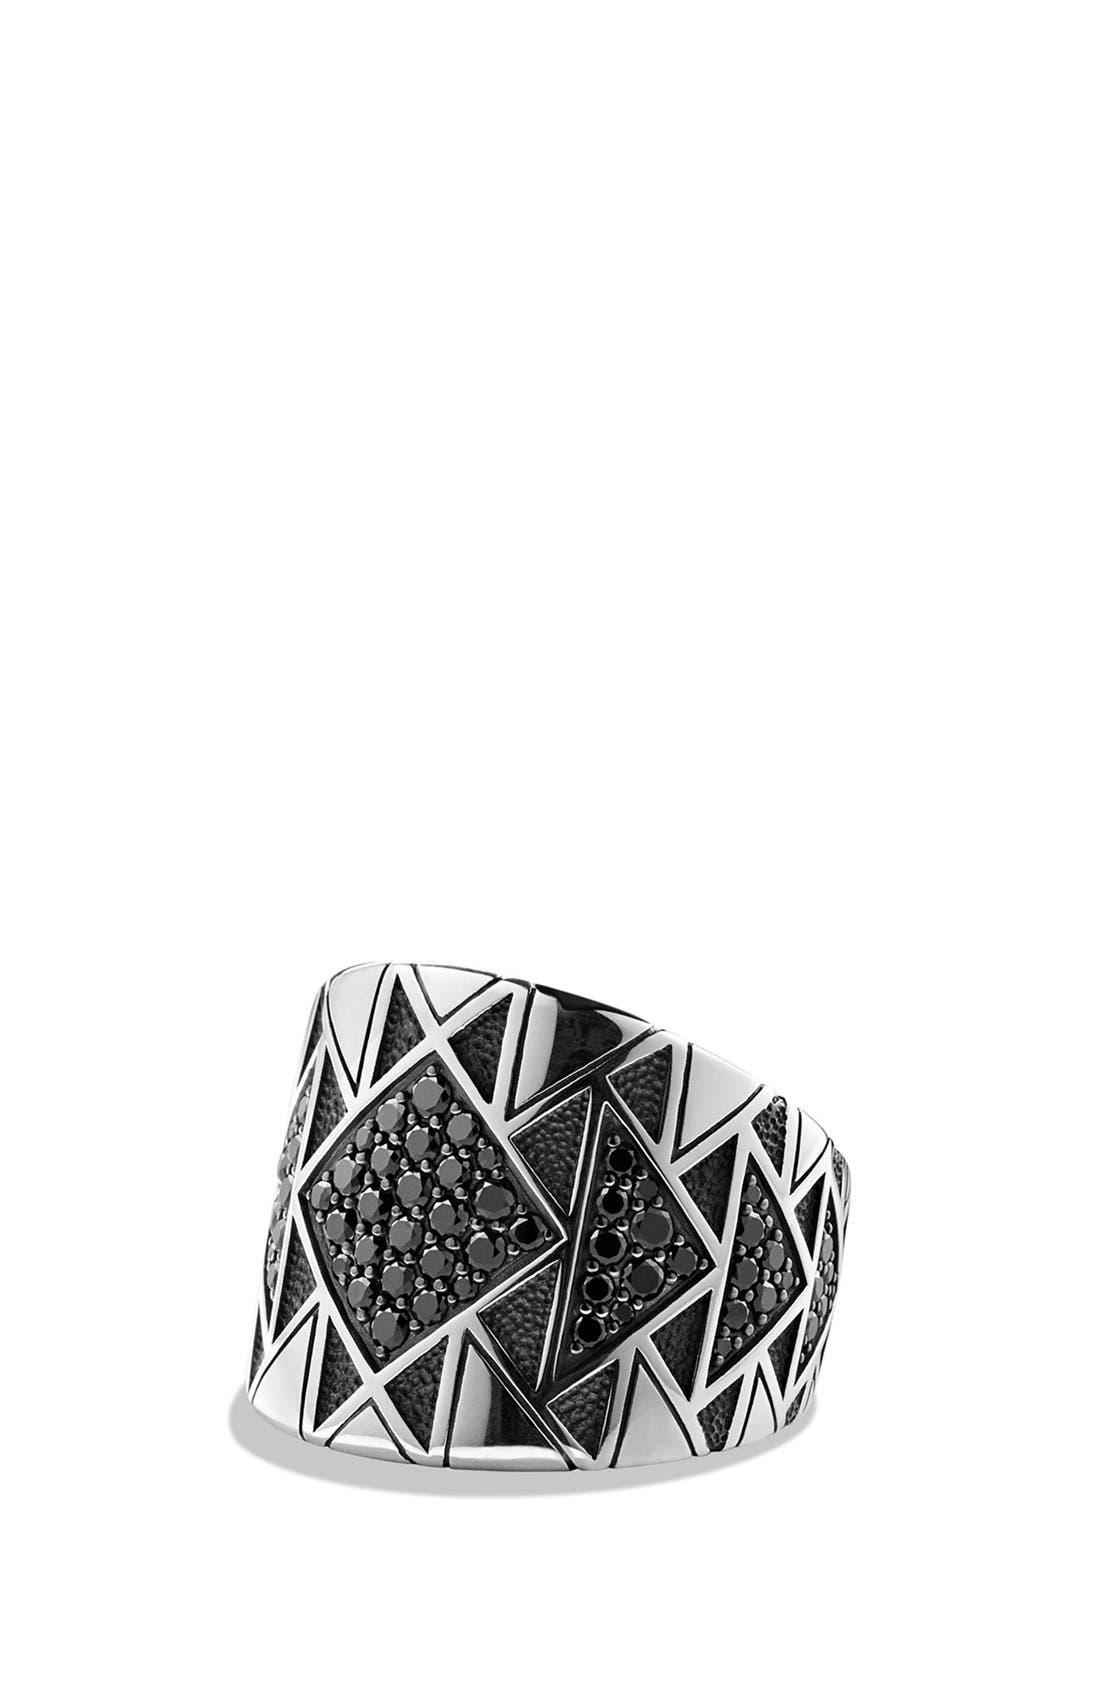 Main Image - David Yurman 'Frontier' Signet Ring with Black Diamonds